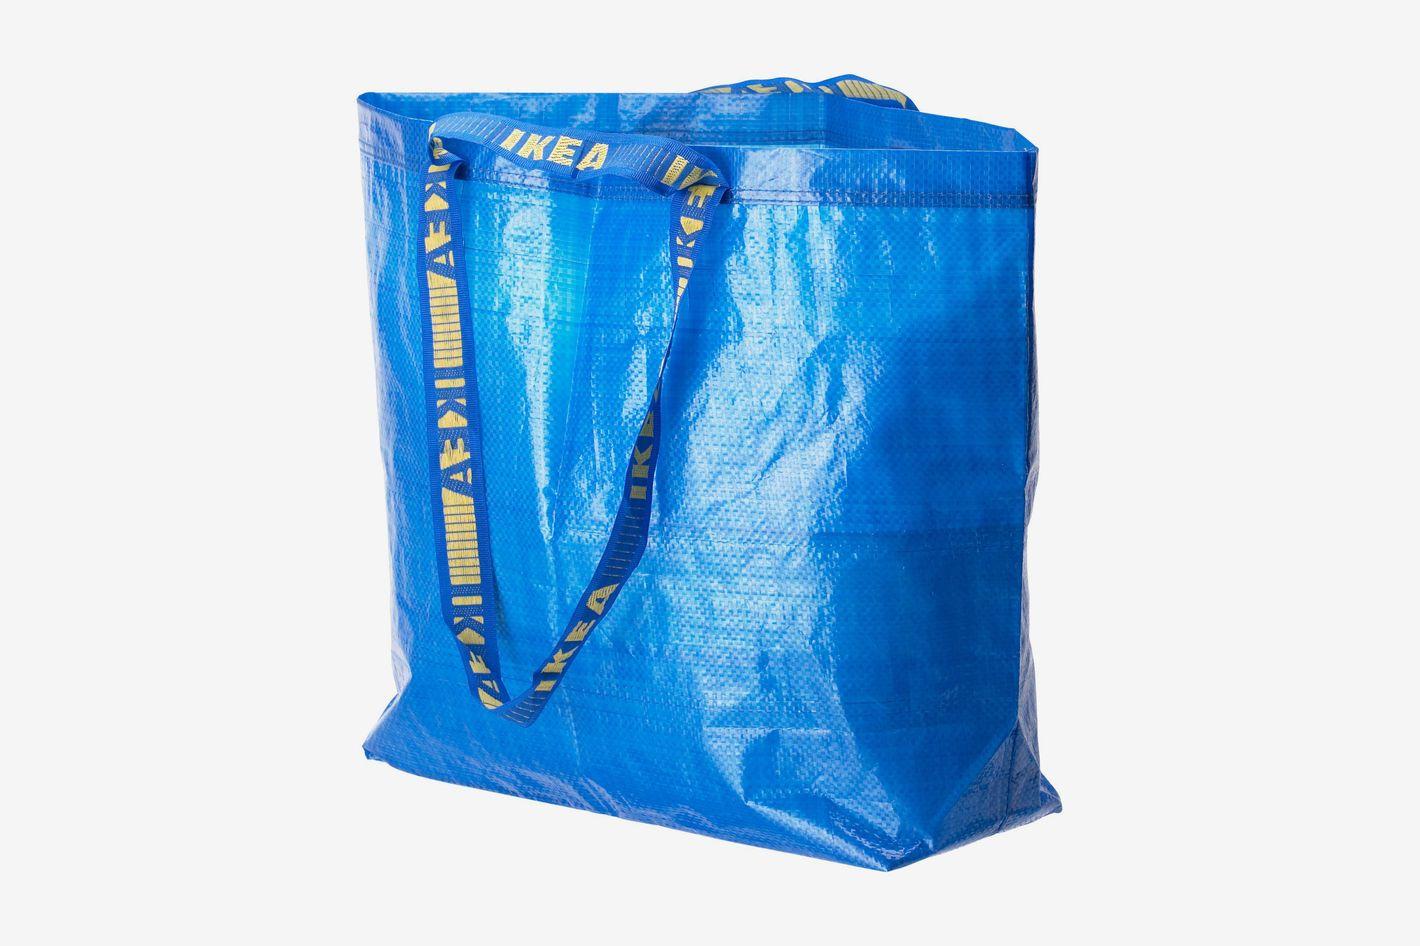 Ikea Frakta Shopping Bags, Set of 4